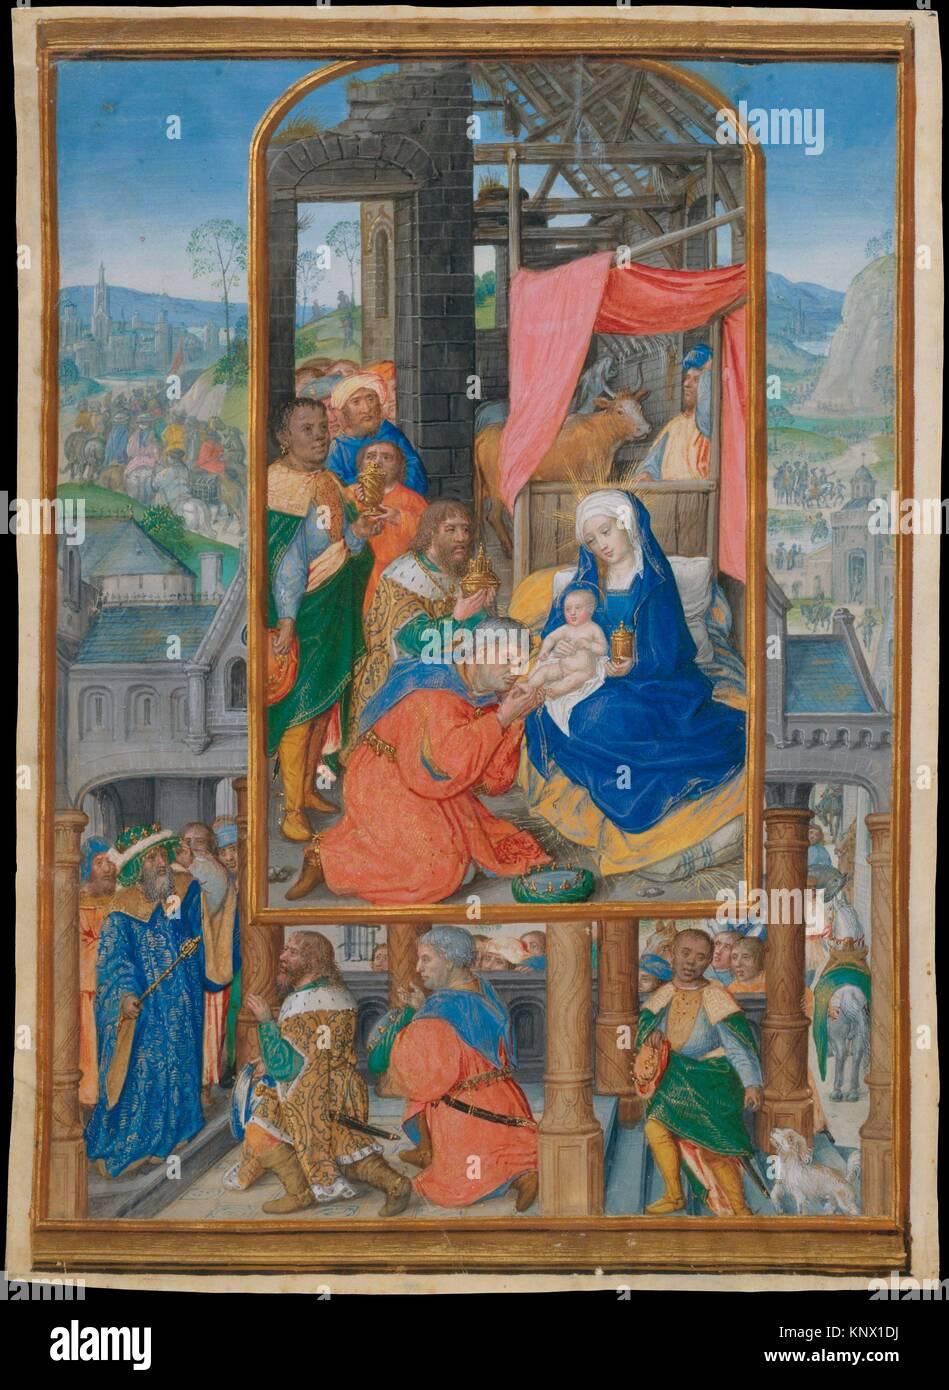 Manuscript Illumination with Adoration of the Magi. Artist: Master of James IV of Scotland (probably Gerard Horenbout) - Stock Image